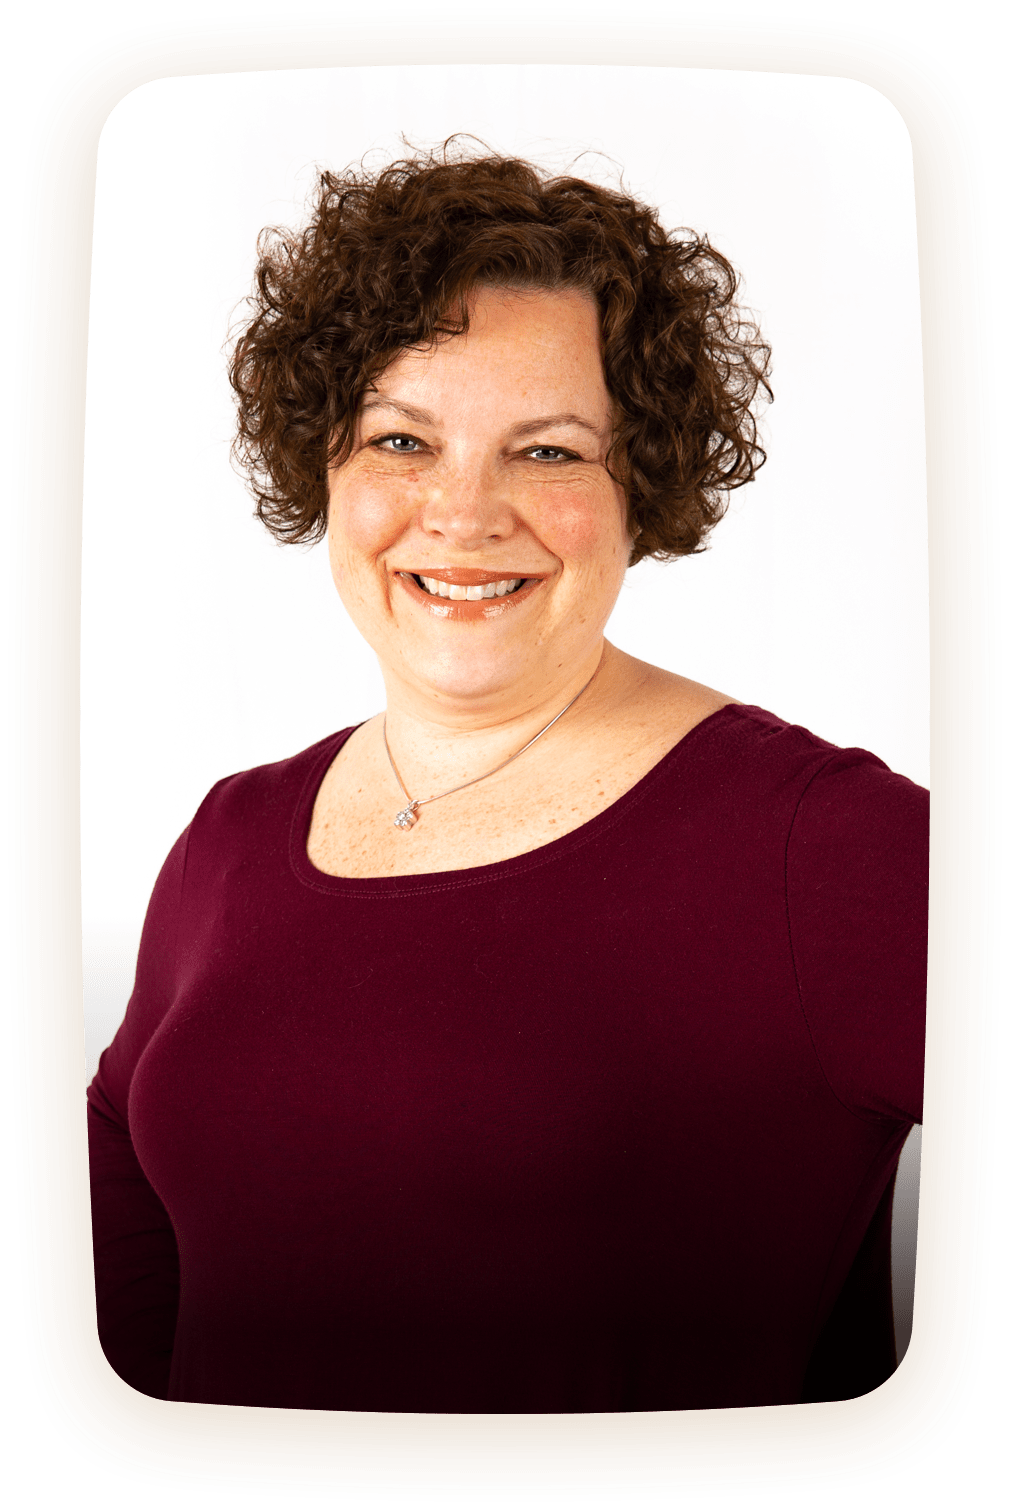 Michelle Sigel, Strategic Account Executive